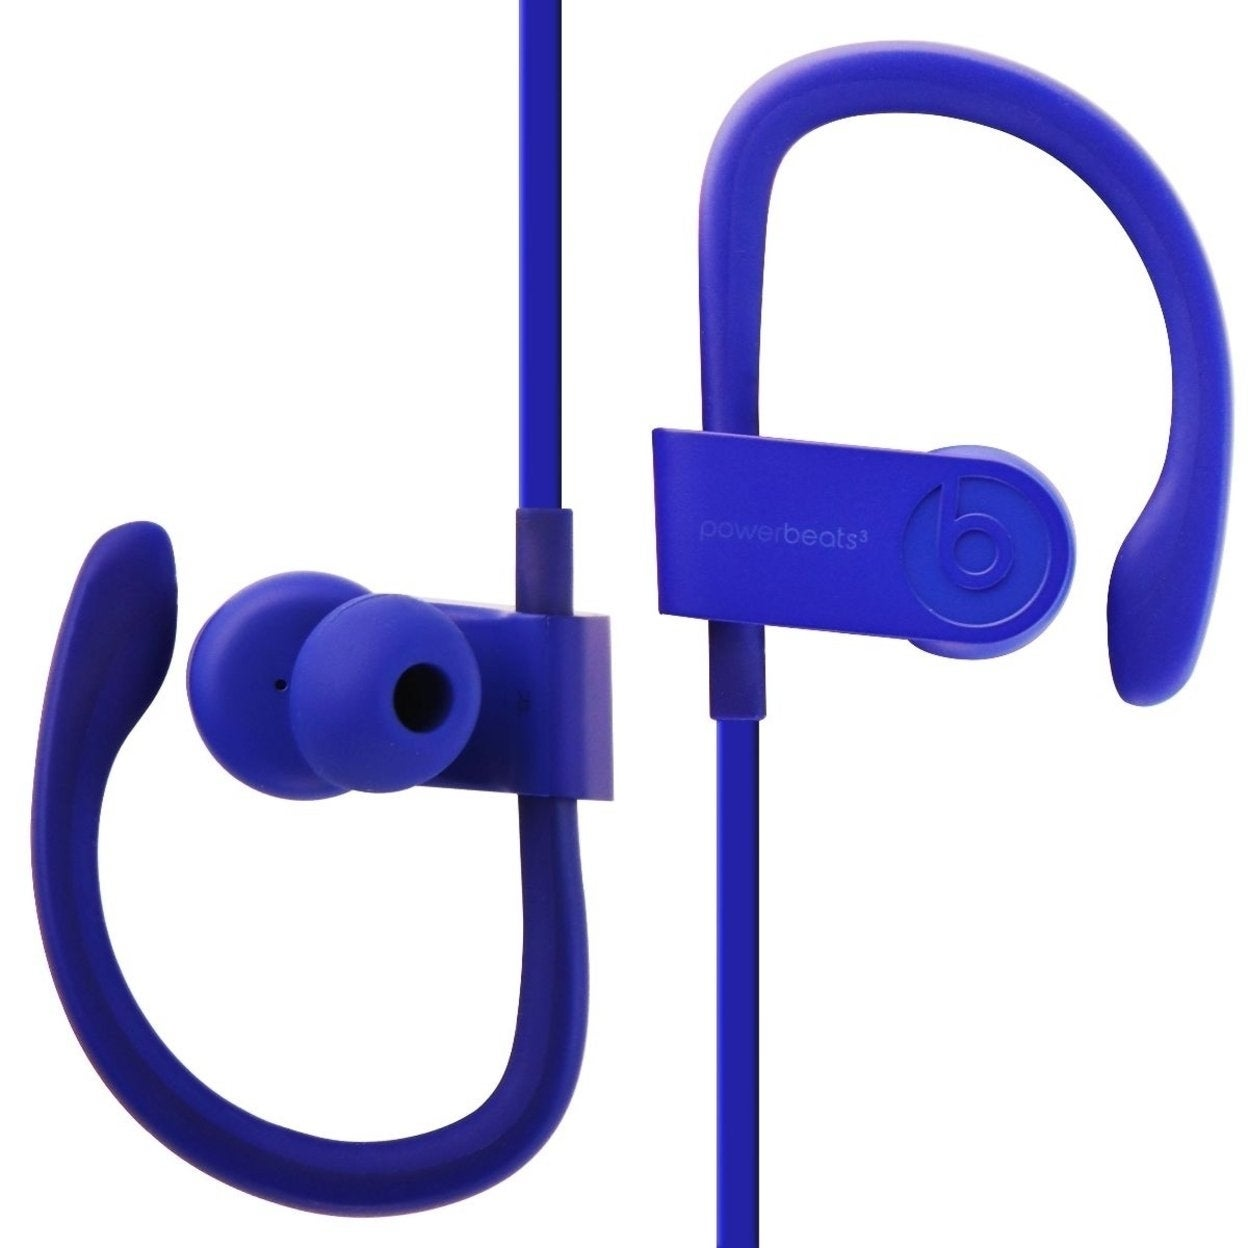 Beats Powerbeats3 Series Wireless Ear-Hook Headphones - Break Blue MQ362LL/A Refurbished